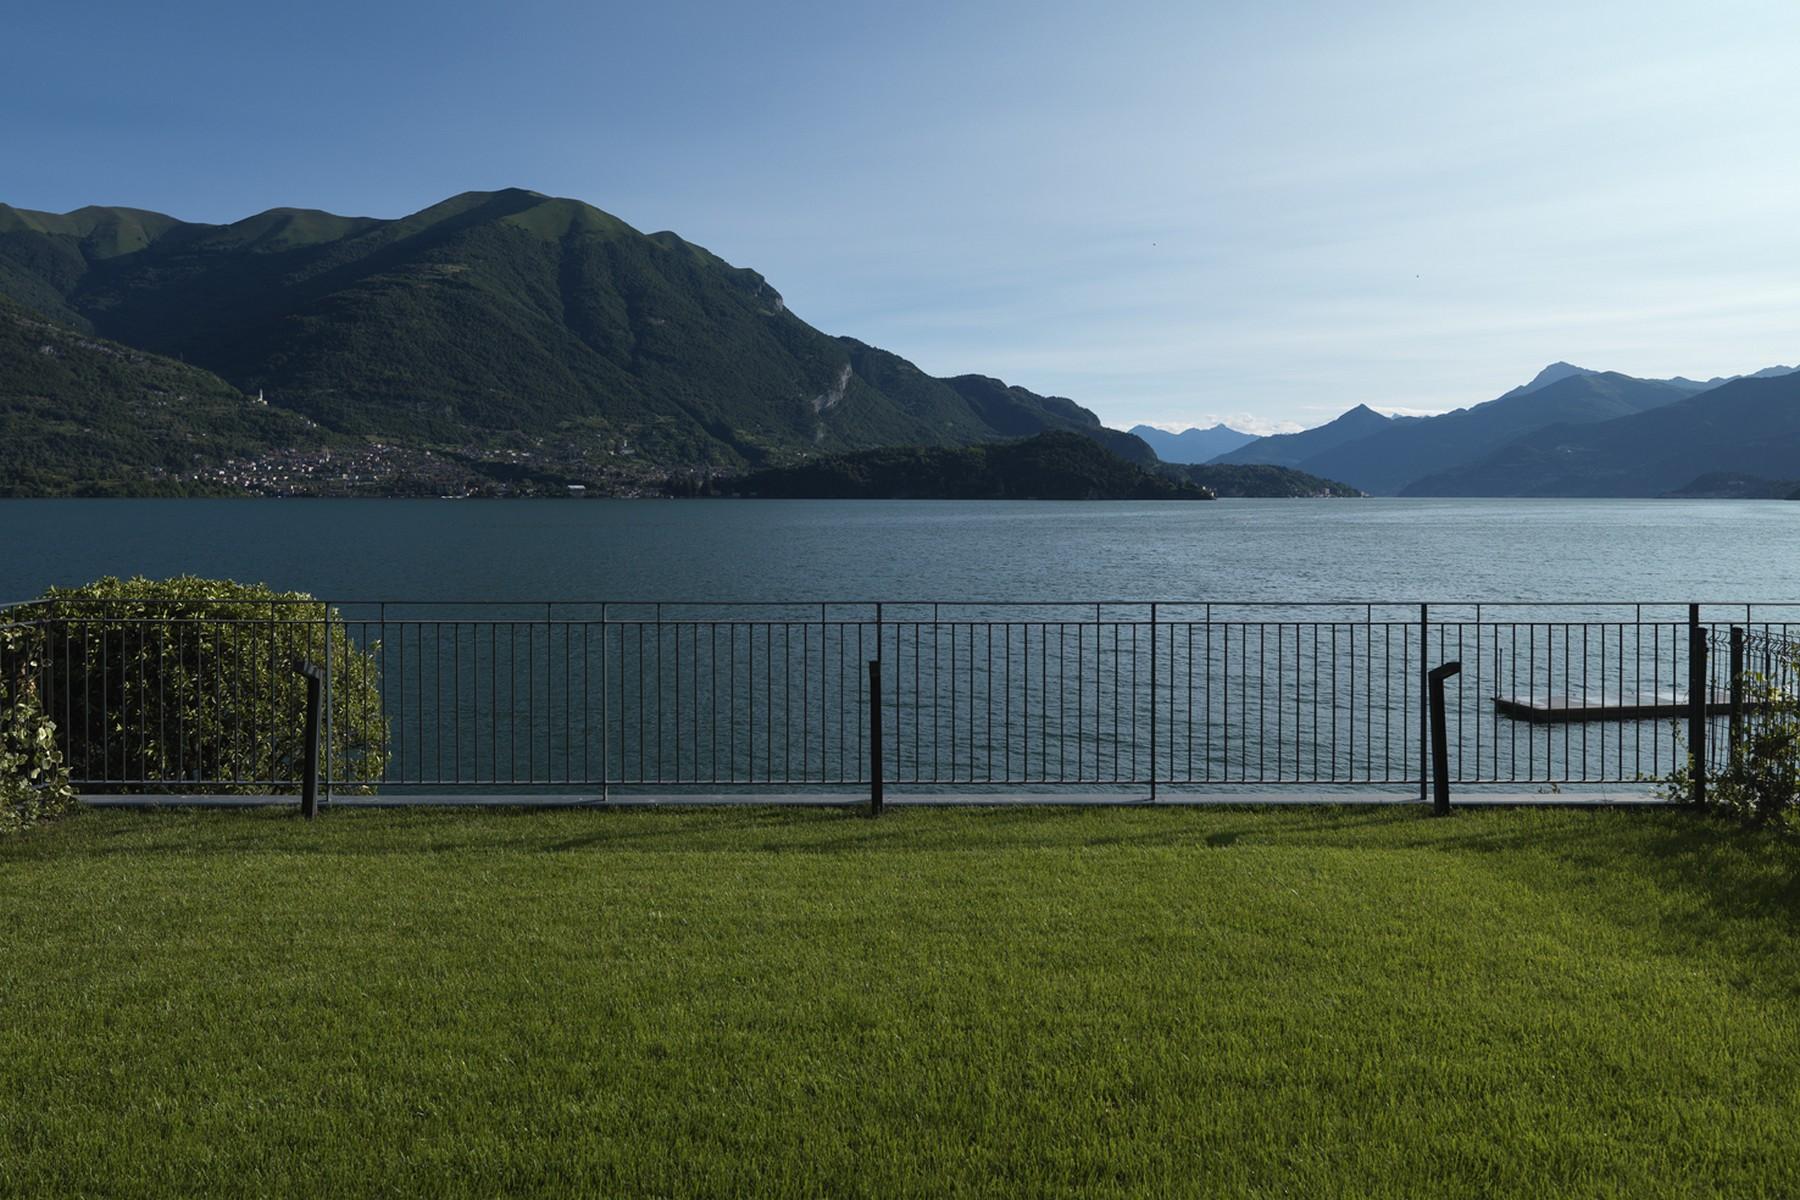 Additional photo for property listing at Splendid semi-independent villa directly on the lake Località Bagnana Lezzeno, Como 22025 Italy